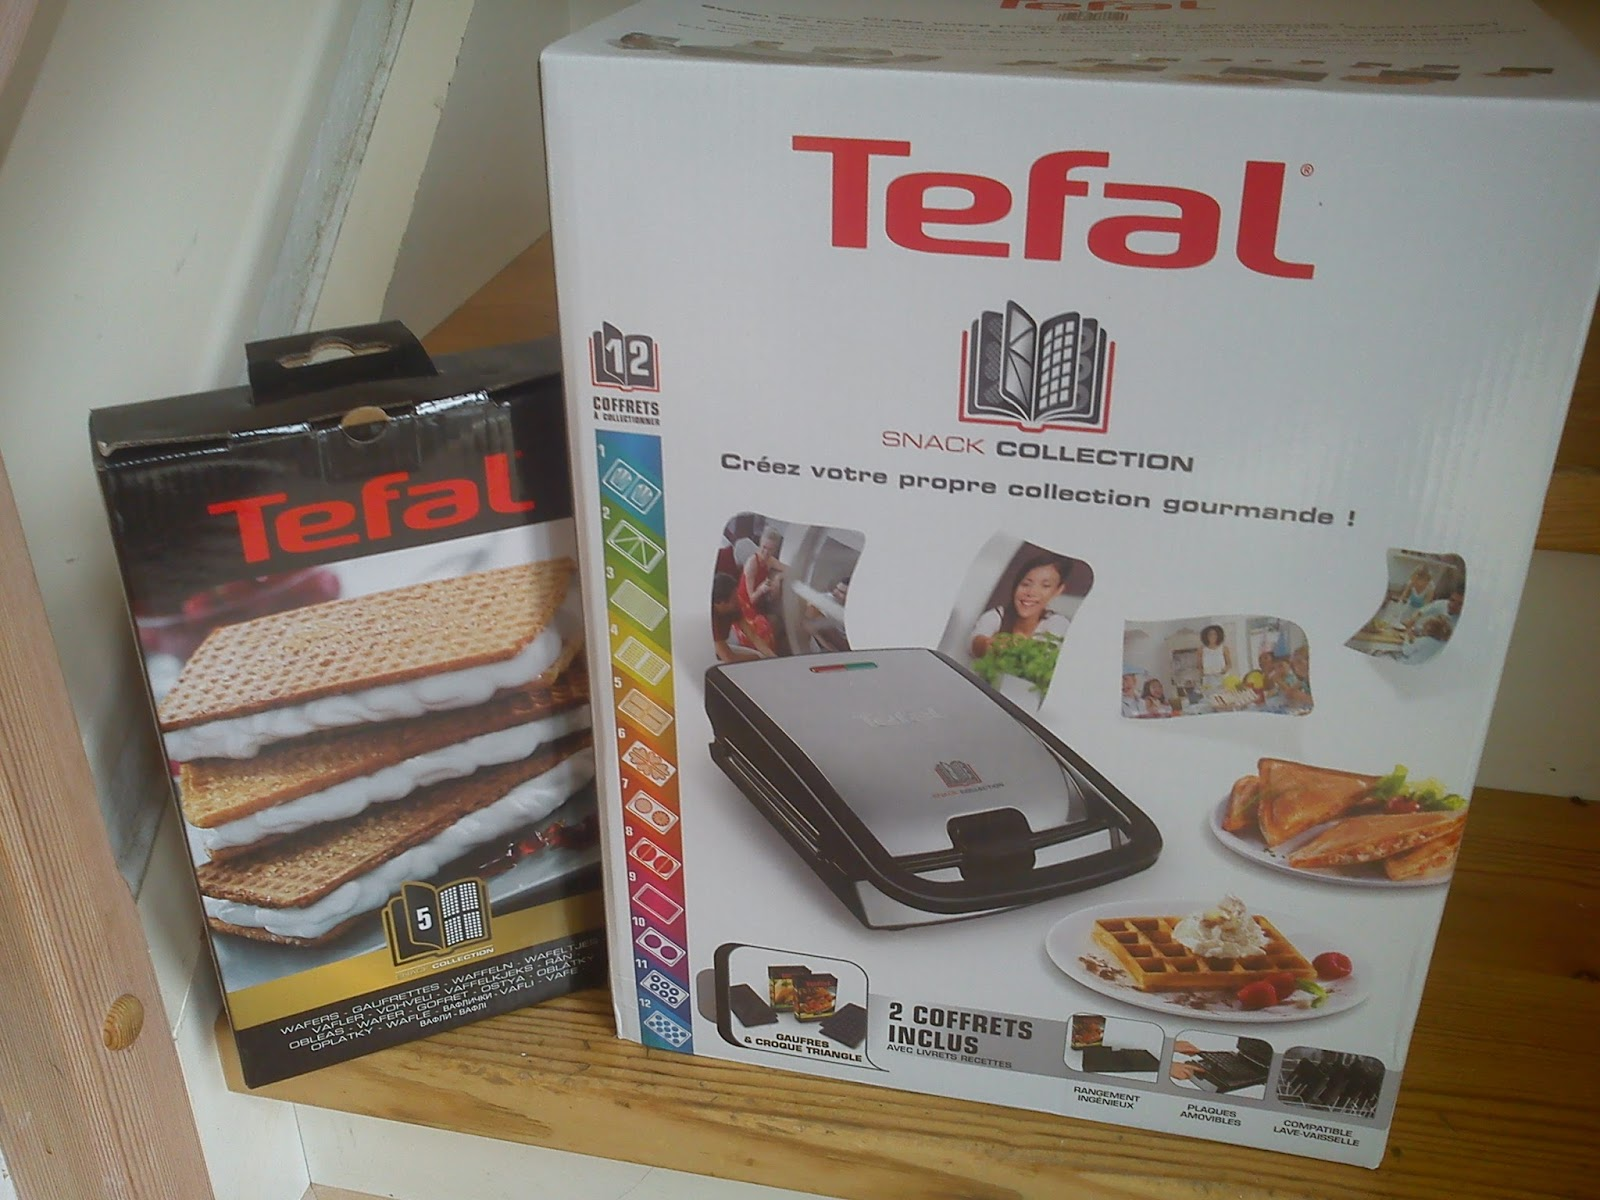 kitchen of kiki tefal snack collection kitchen equipment 27. Black Bedroom Furniture Sets. Home Design Ideas